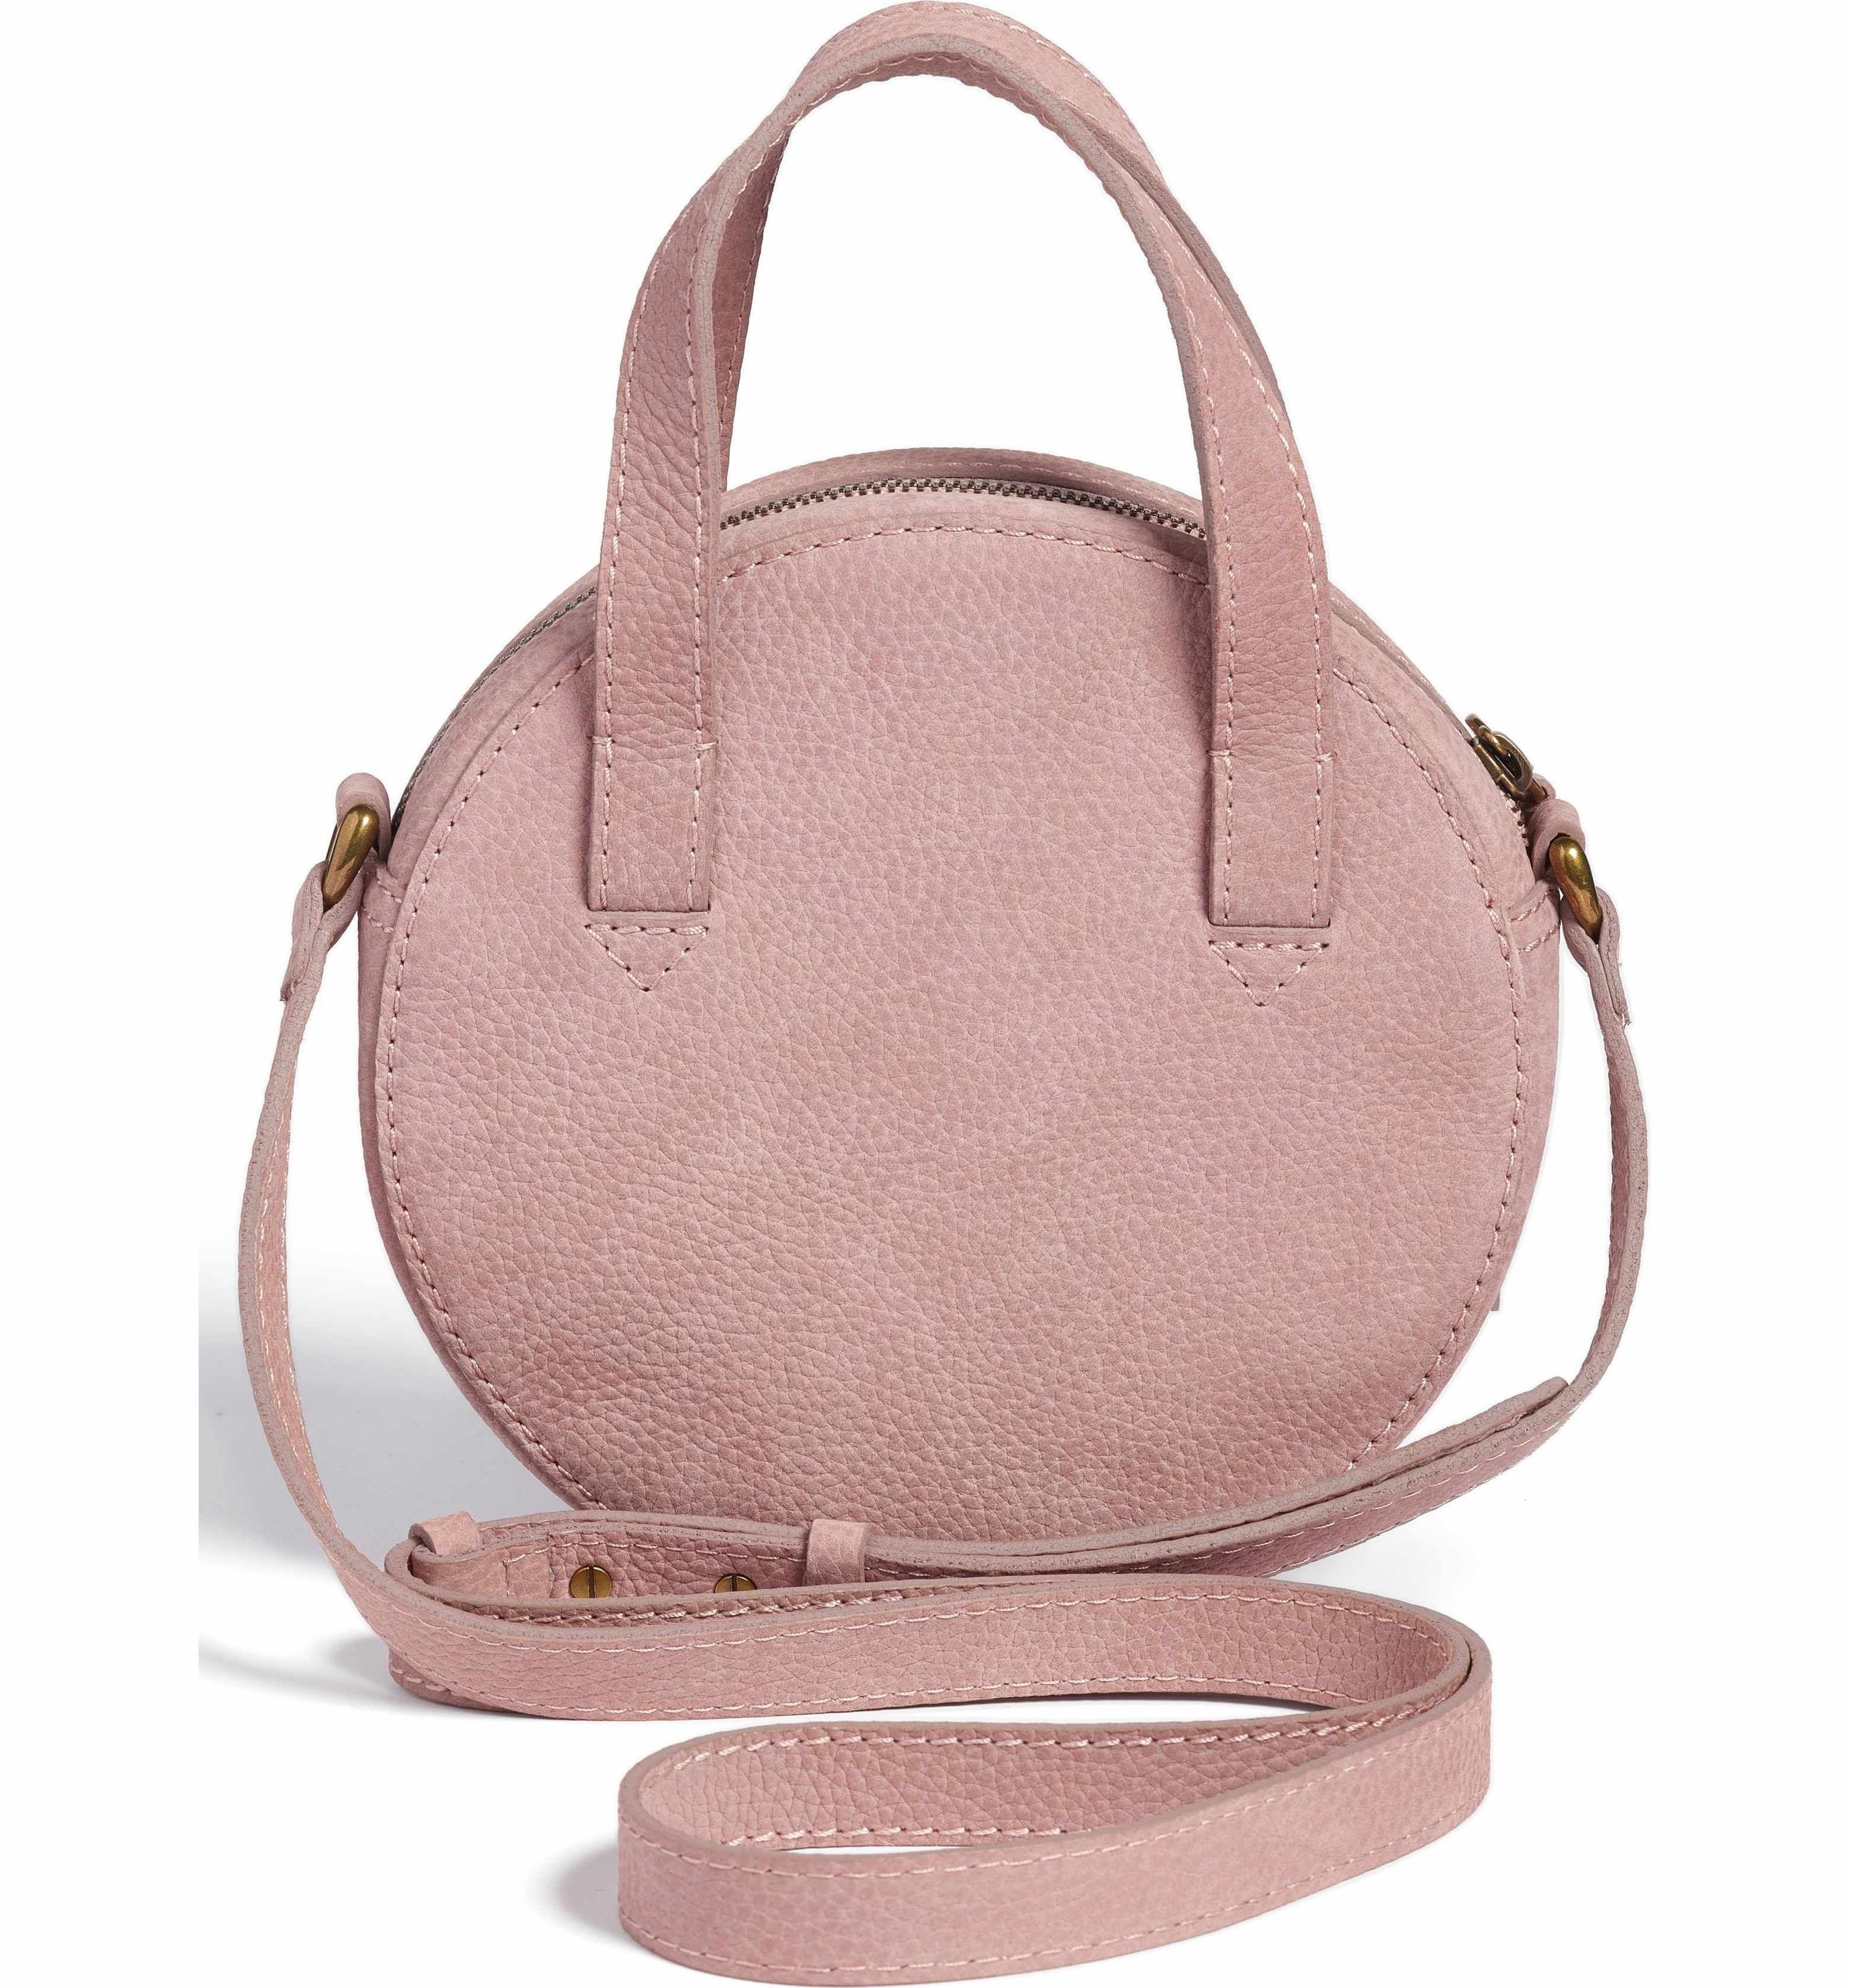 Main Image Madewell Juno Circle Leather Crossbody Bag